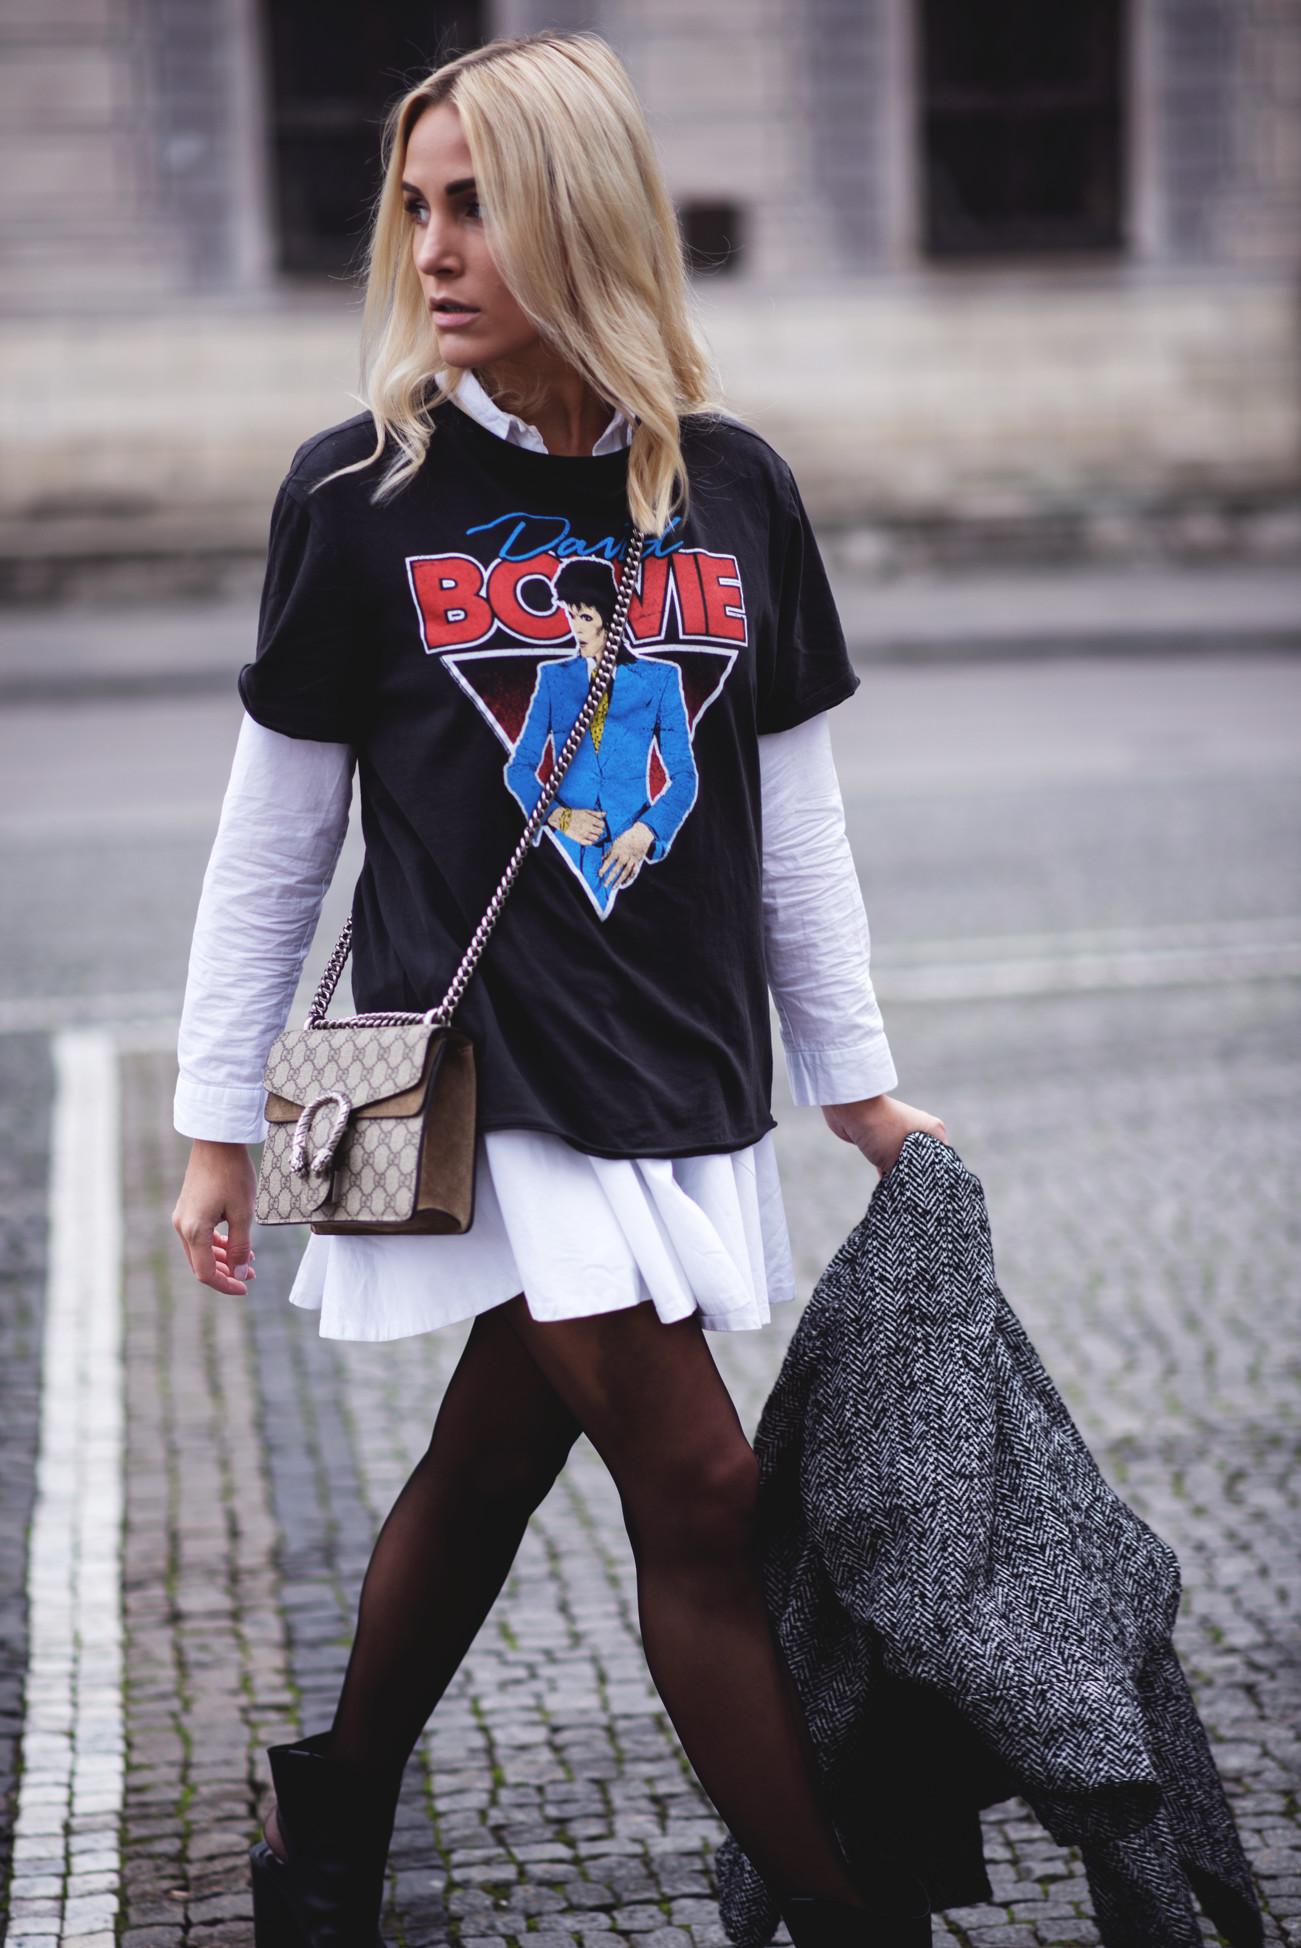 davidbowie-bandshirt-guccidionysus-fashion-fashionblogger-munich-sequinsophia-4-dsc_3820